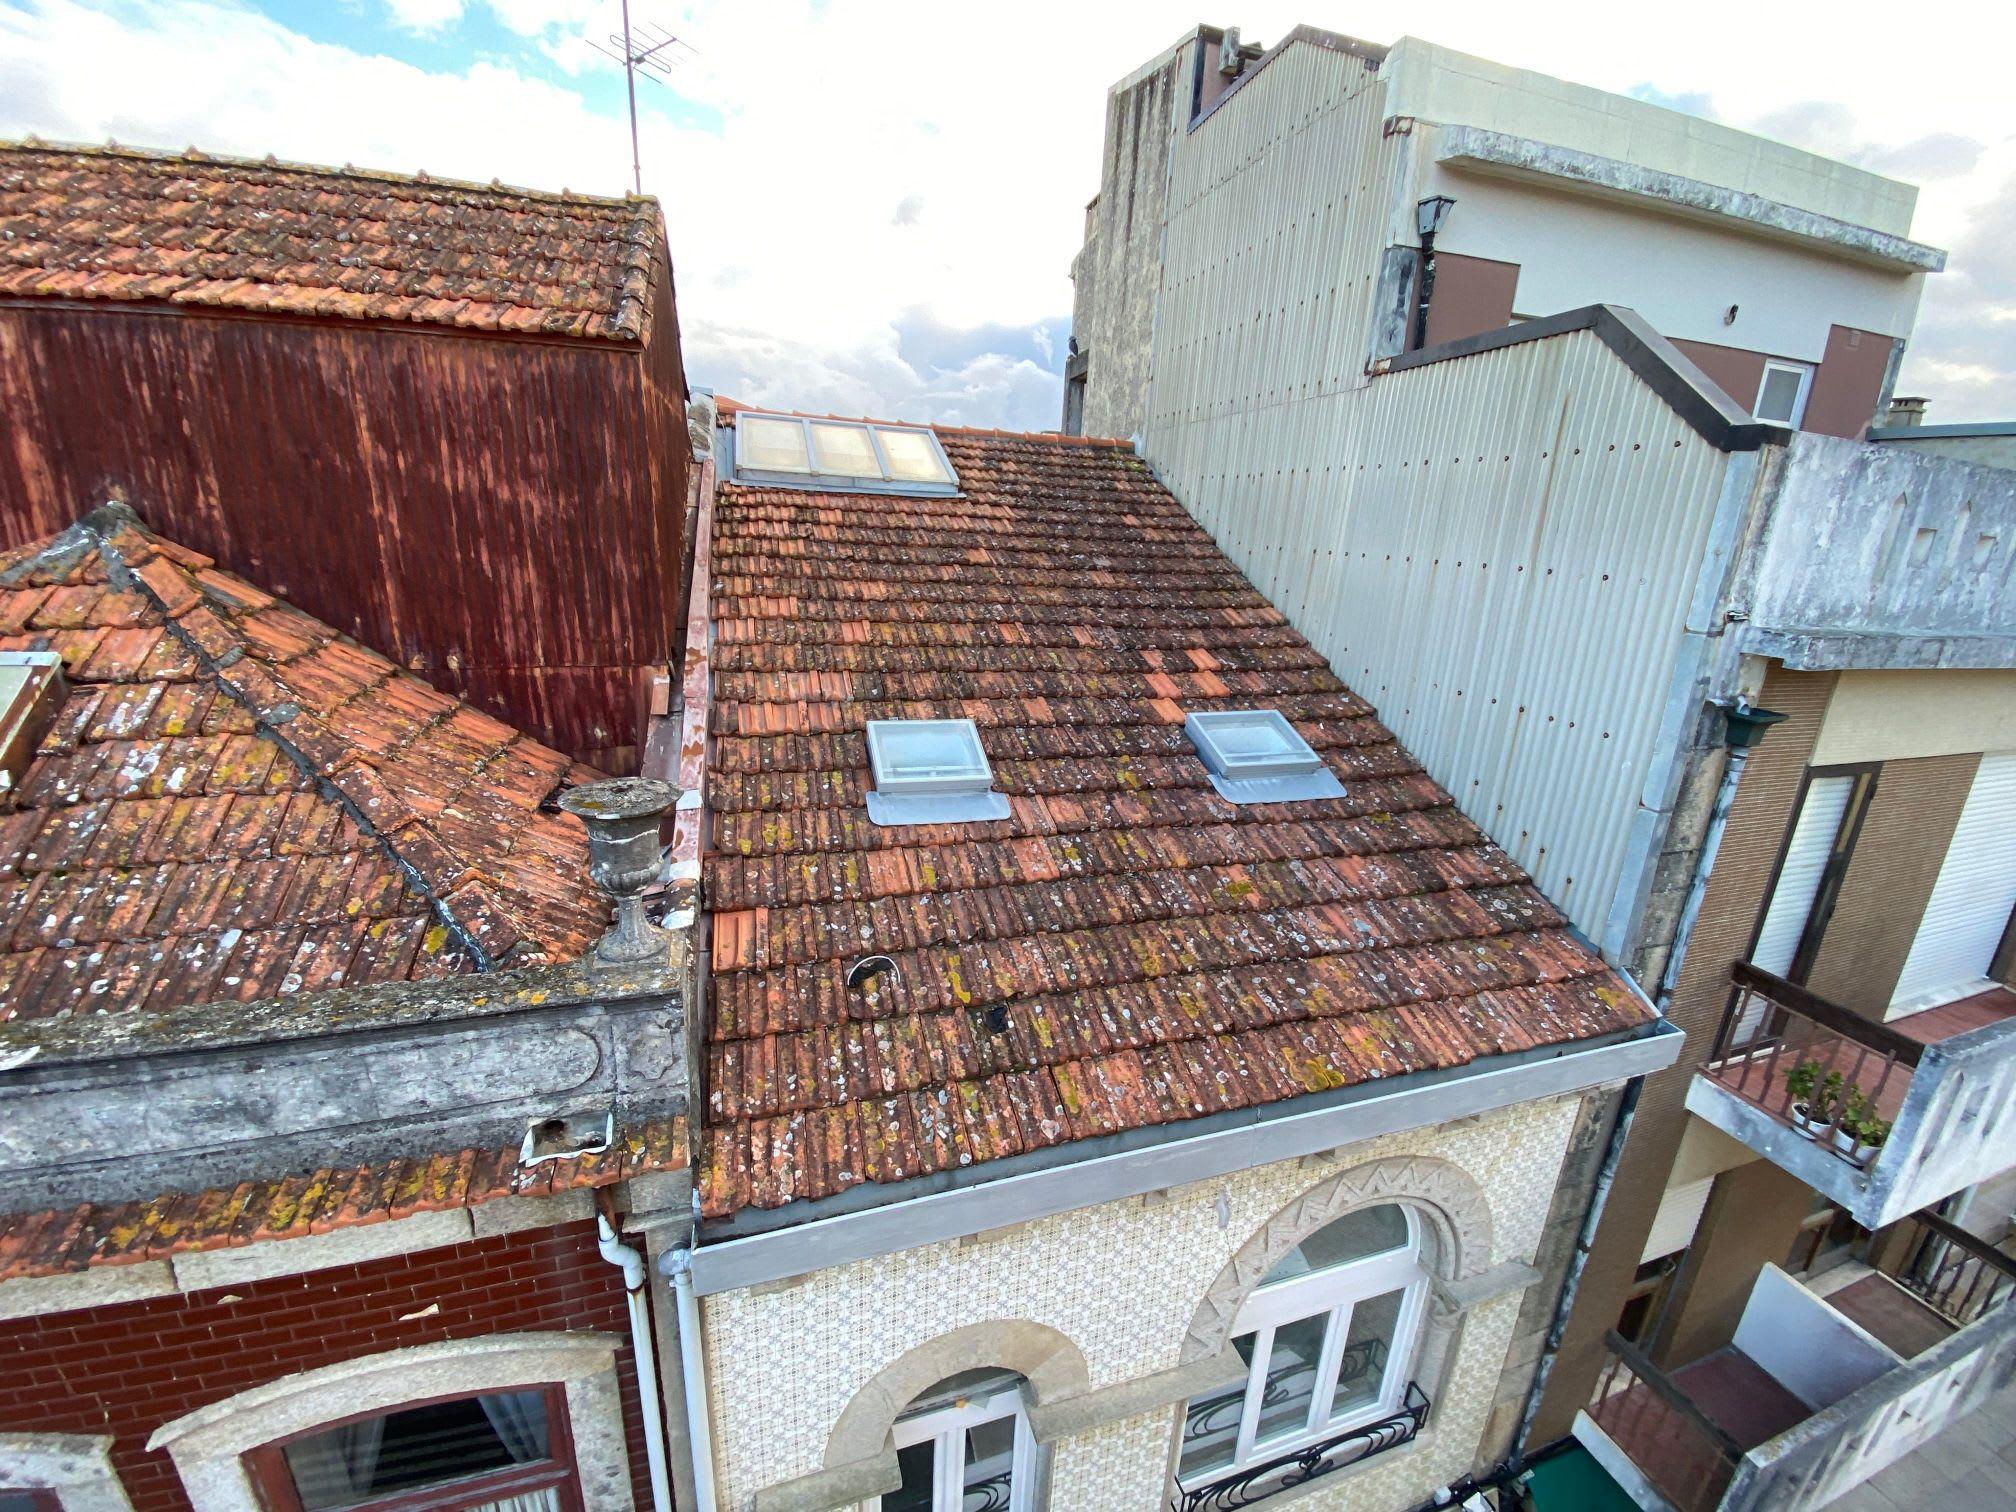 Limpeza de telhado - ficou como novo image